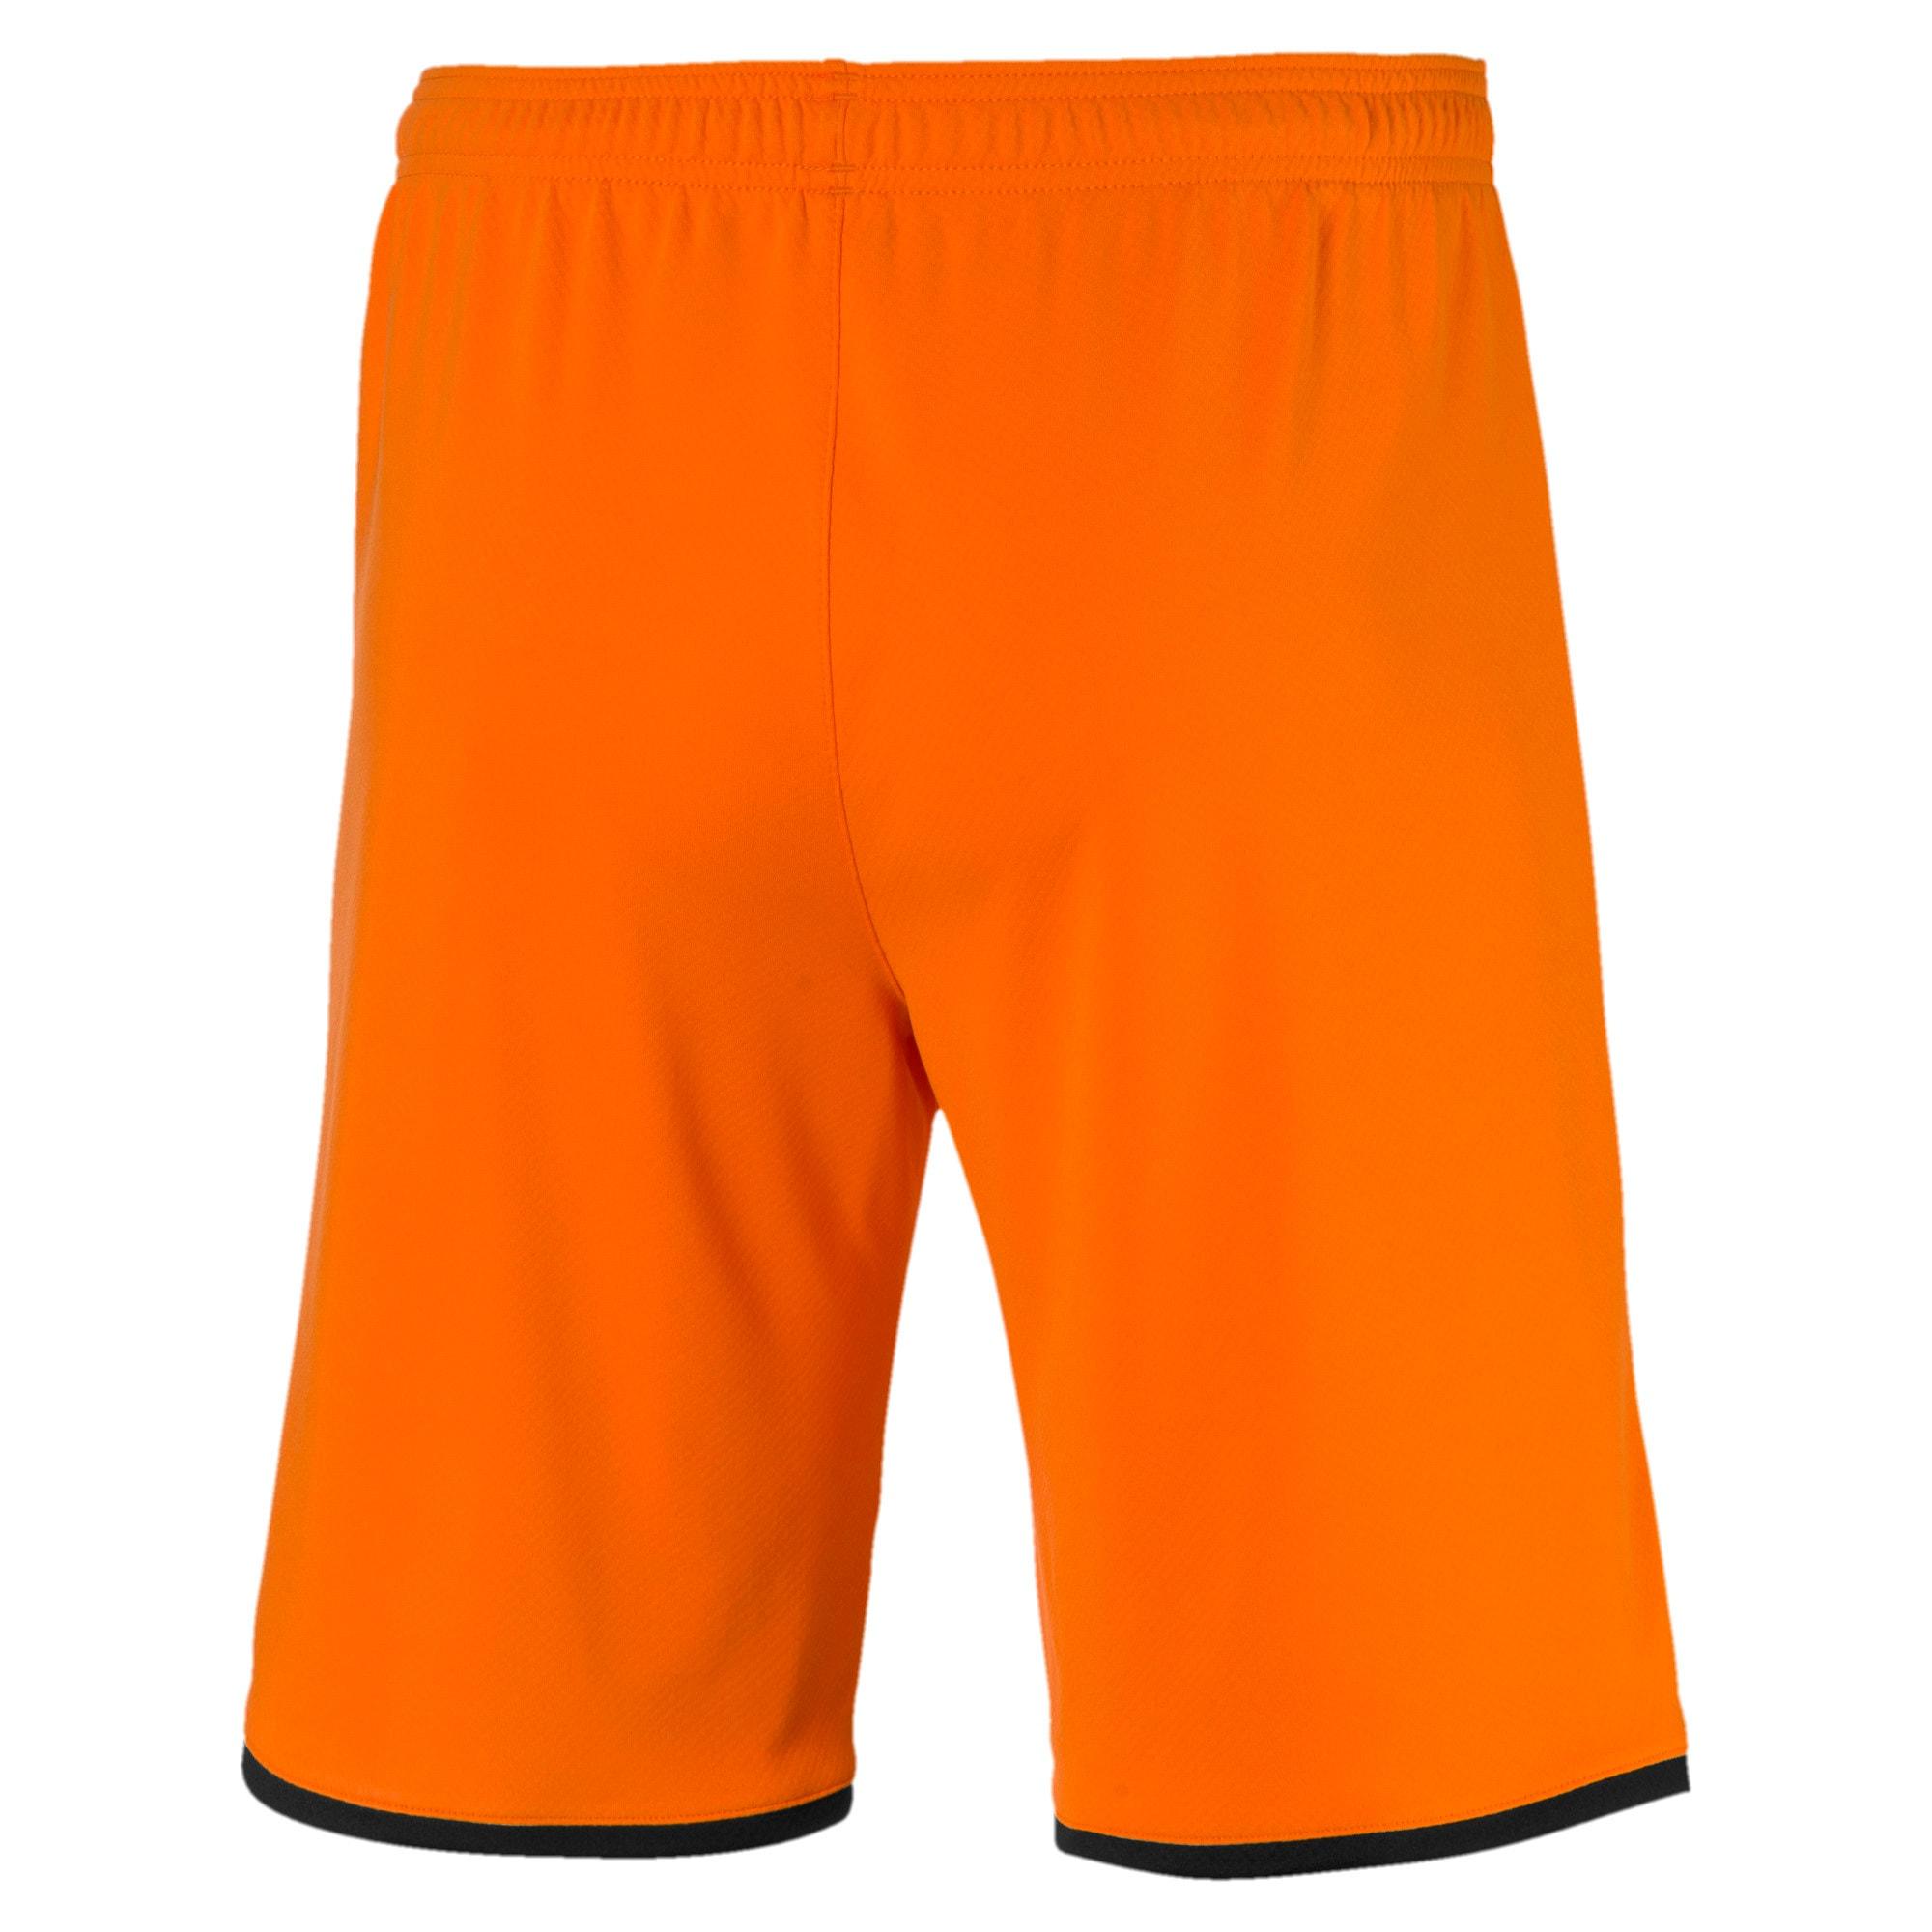 Thumbnail 2 of Valencia CF Men's Replica Shorts, Vibrant Orange-Puma Black, medium